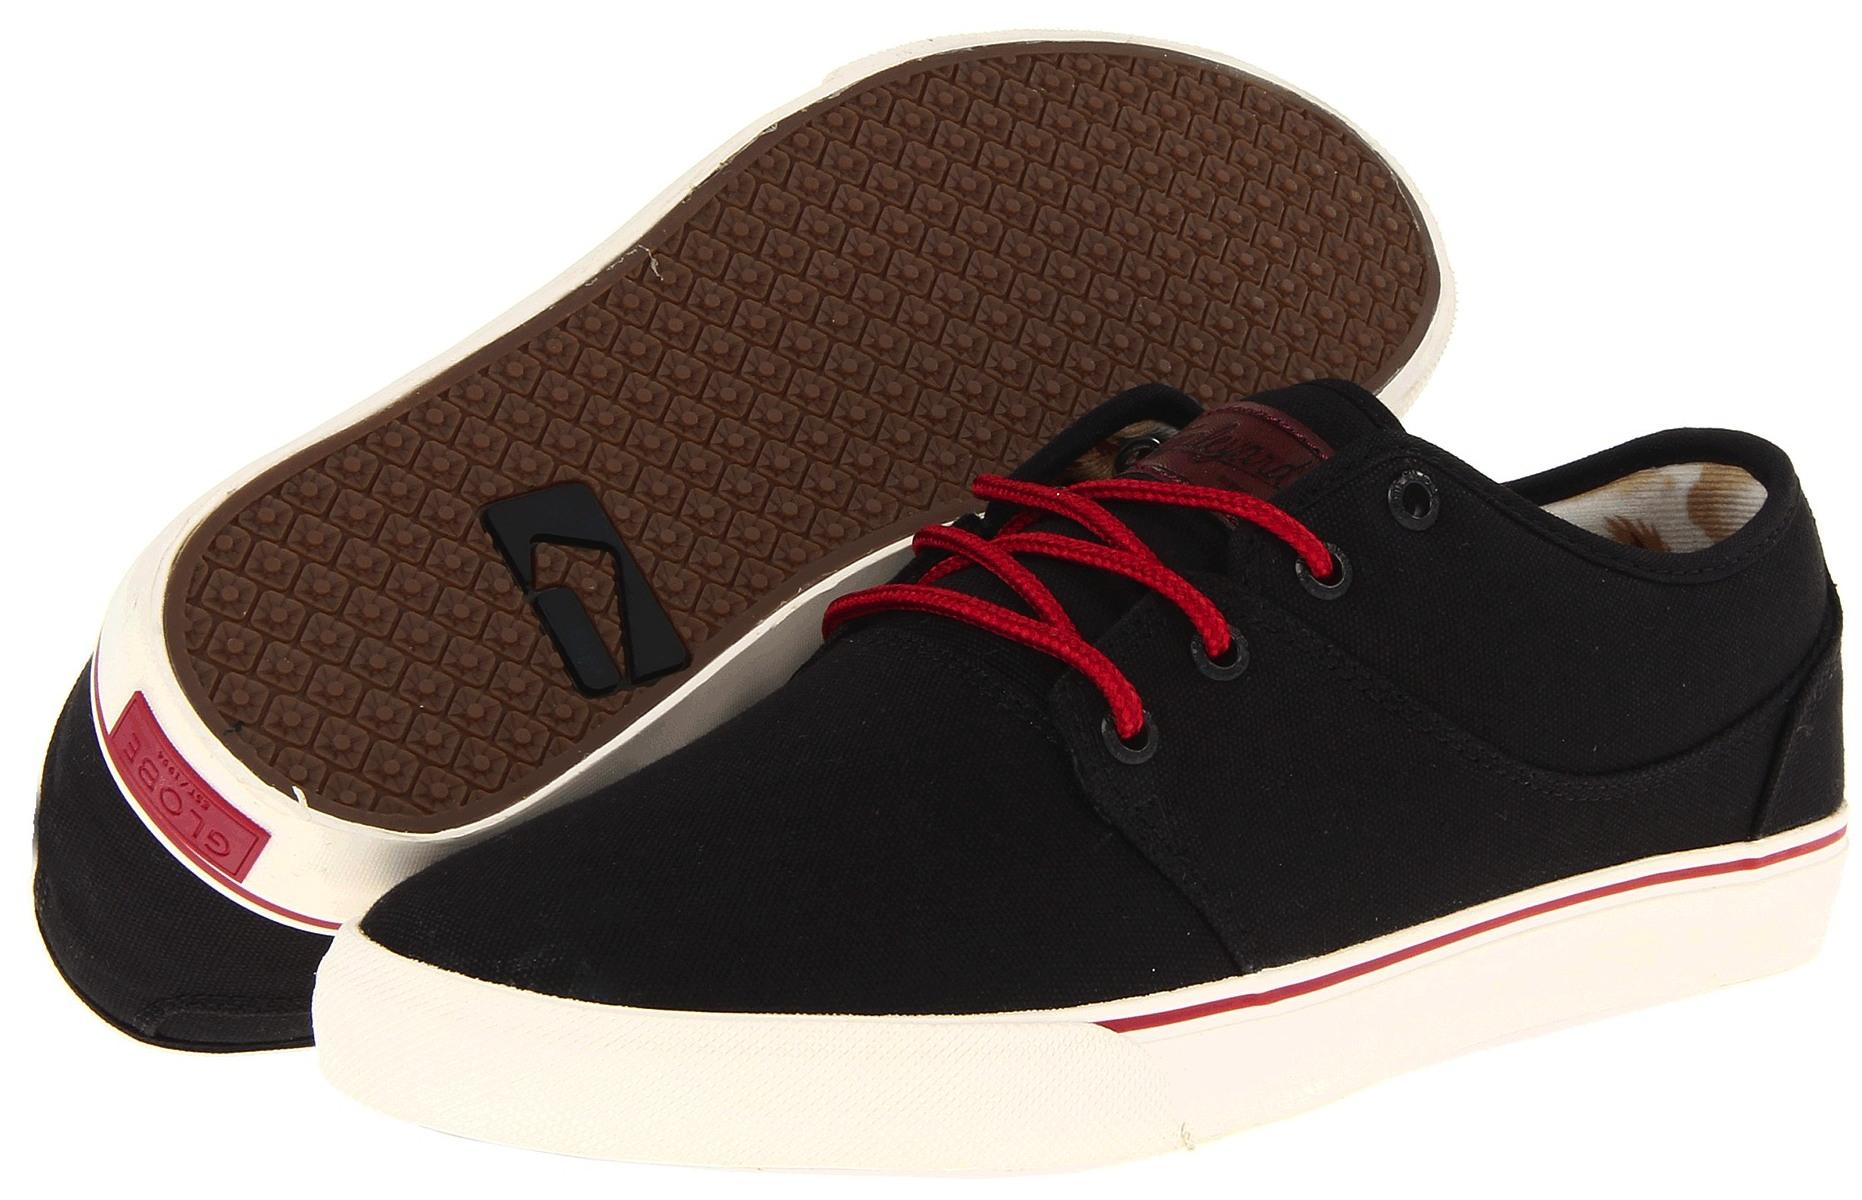 Hemp Vegan Globe Mahalo Skateboard shoes Mark Appleyard